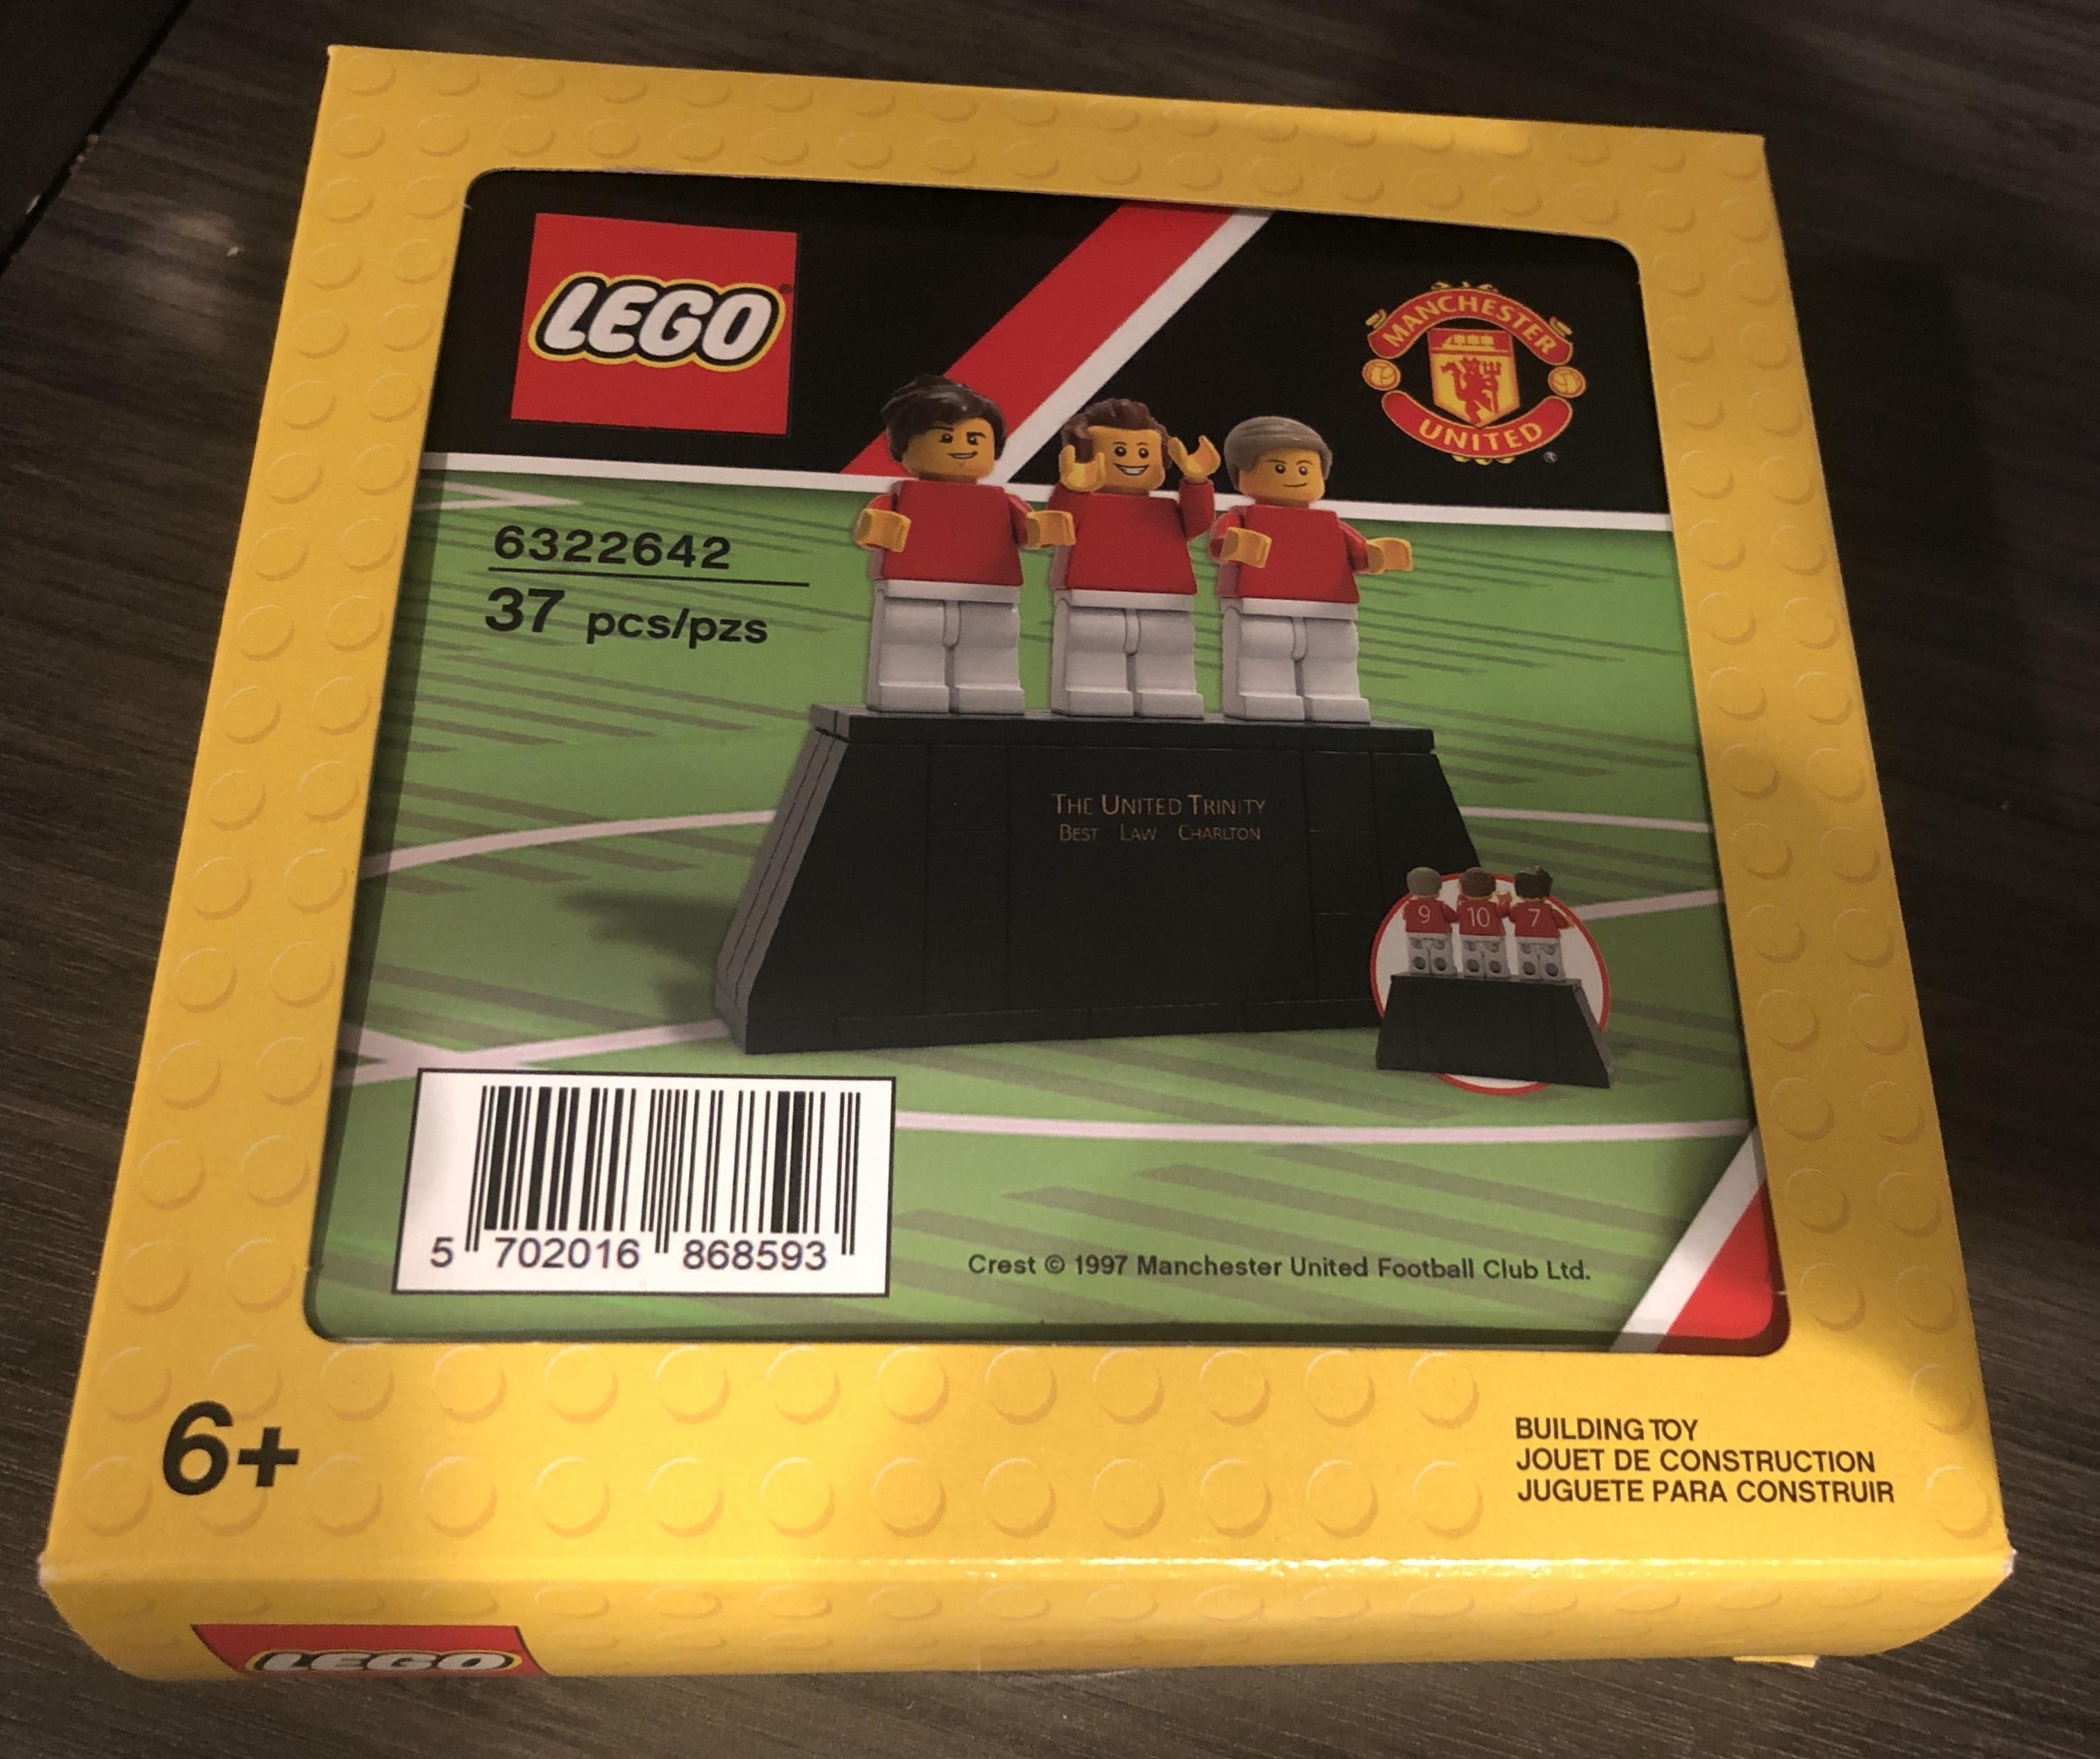 10272 - Old Trafford - Manchester United - Page 5 - Creator - BRICKPICKER